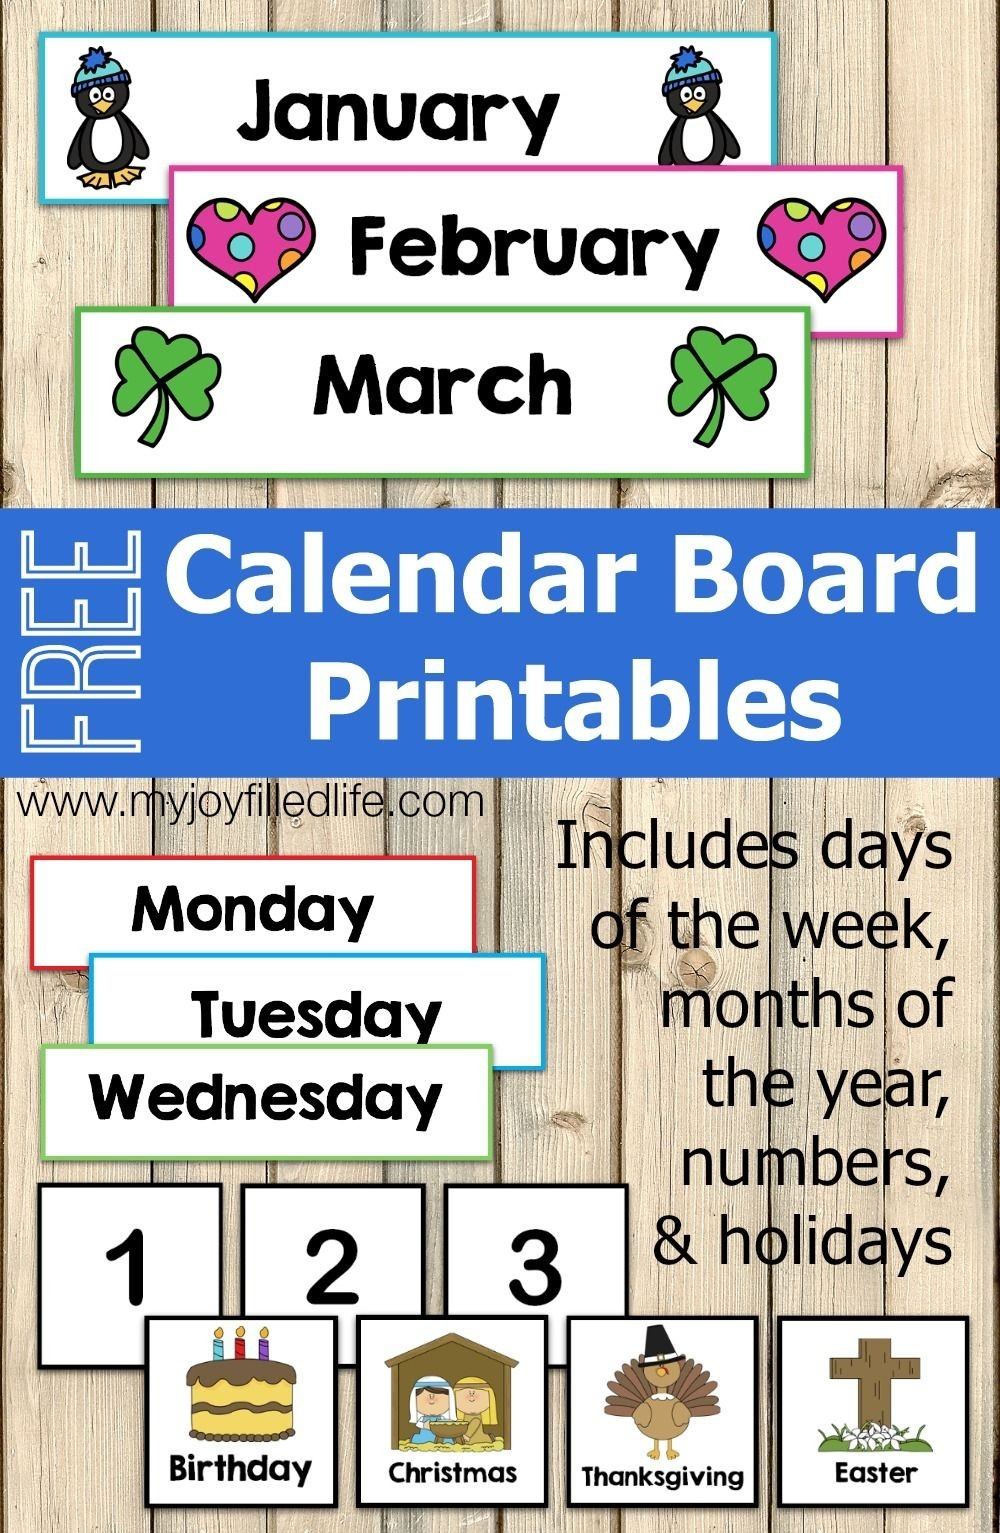 Free Calendar Board Printables | Preschool Calendar-Blank Preschool Class Calendar